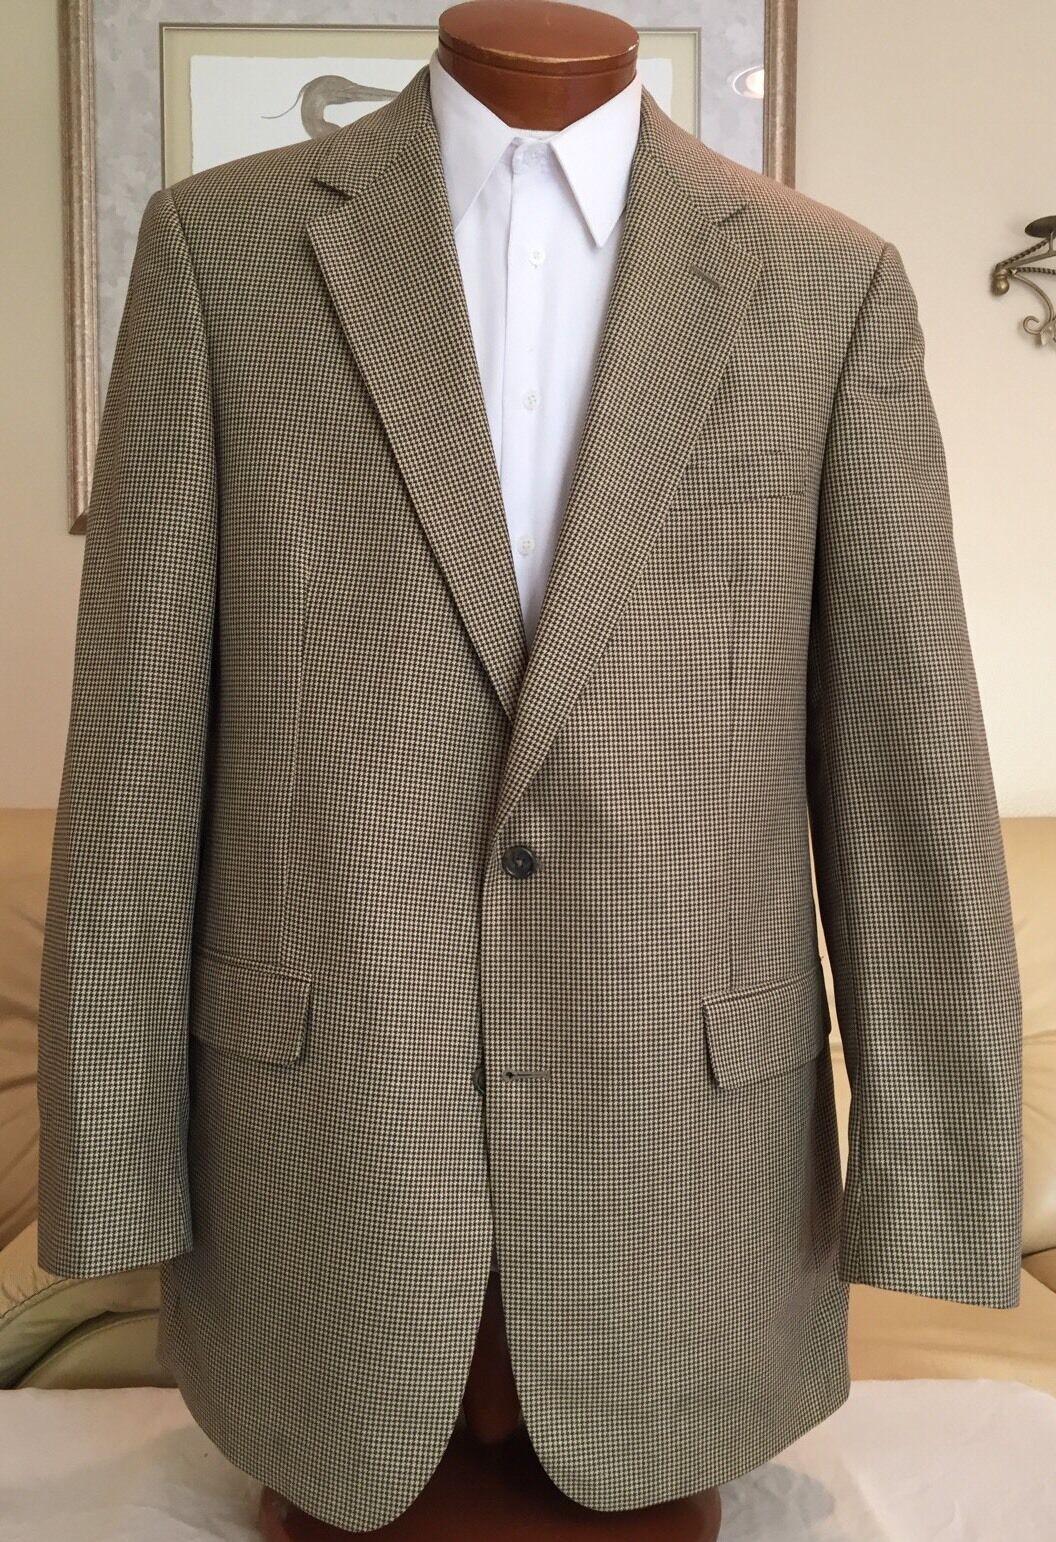 Brooks Brothers  Herren Braun Beige Houndstooth Wool Coat Blazer Sz 42 XL MINT